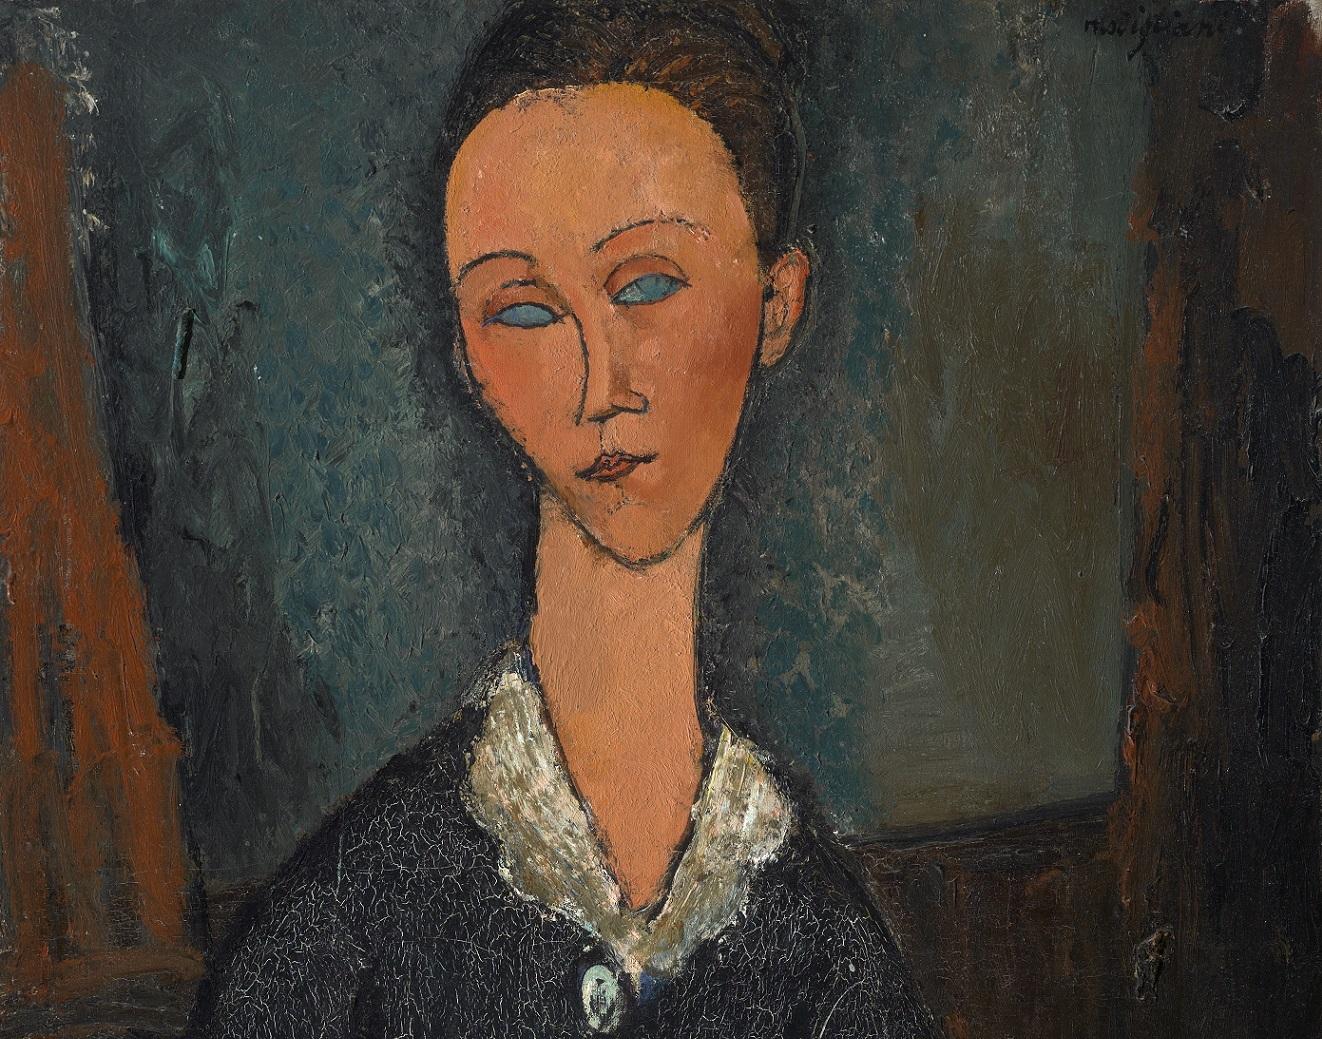 Amedeo Modigliani, Femme au col blanc, 1917, olio su tela. Particolare.jpg